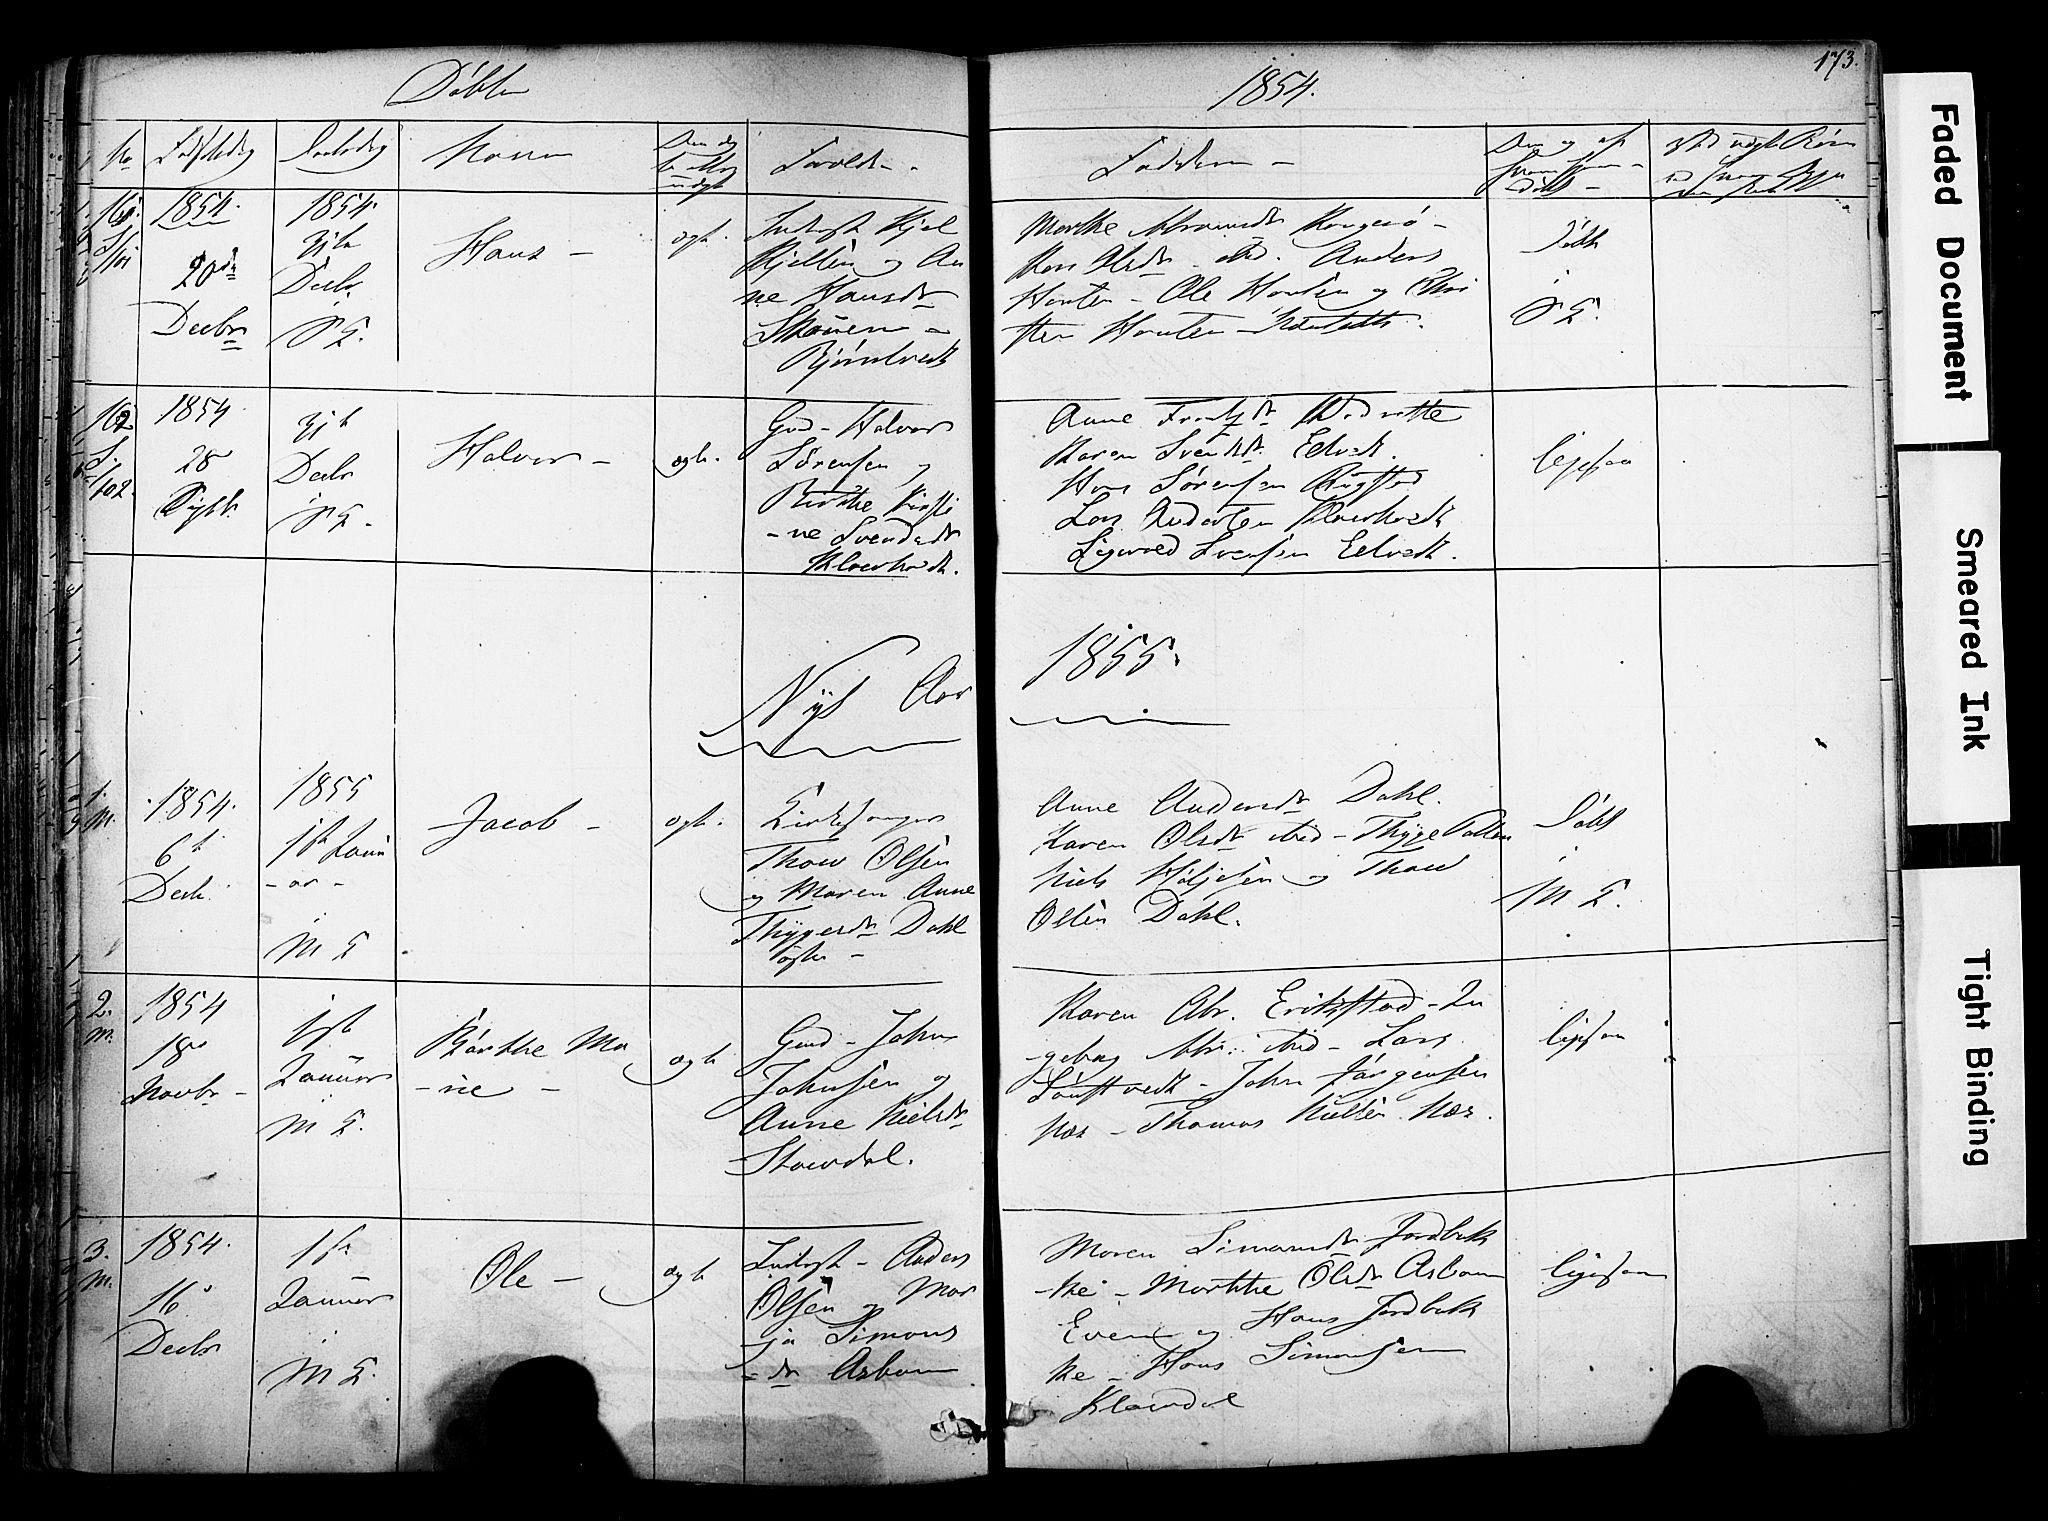 SAKO, Solum kirkebøker, F/Fa/L0006: Ministerialbok nr. I 6, 1844-1855, s. 173